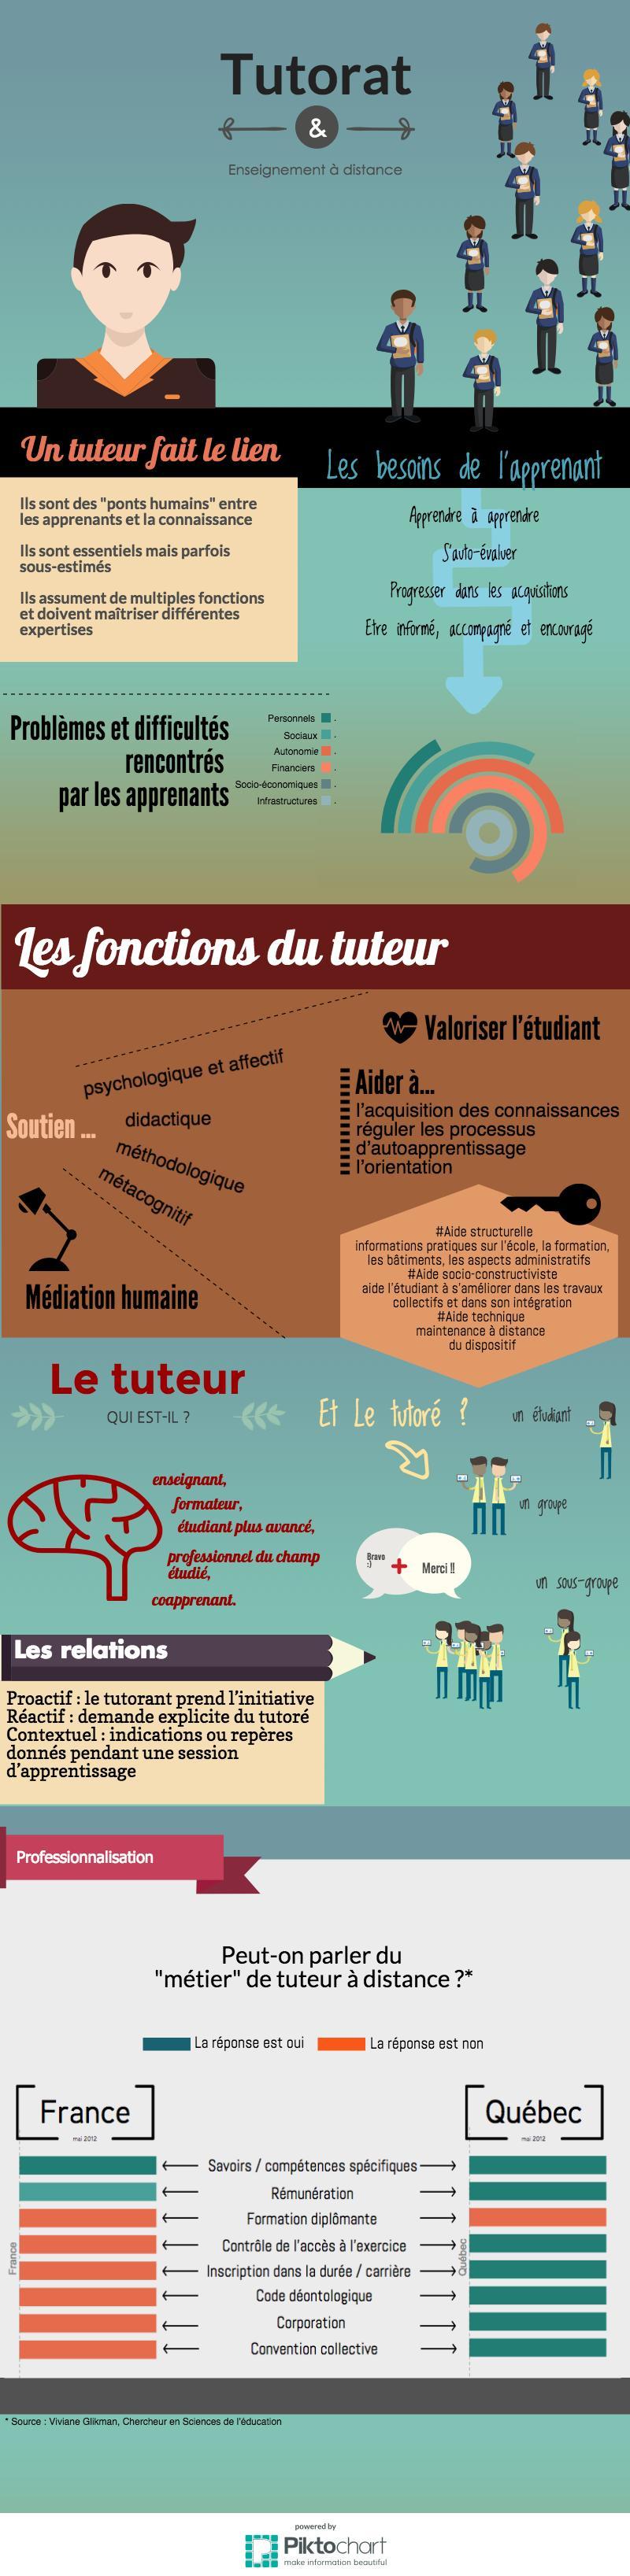 Infographie : Tutorat et apprentissage